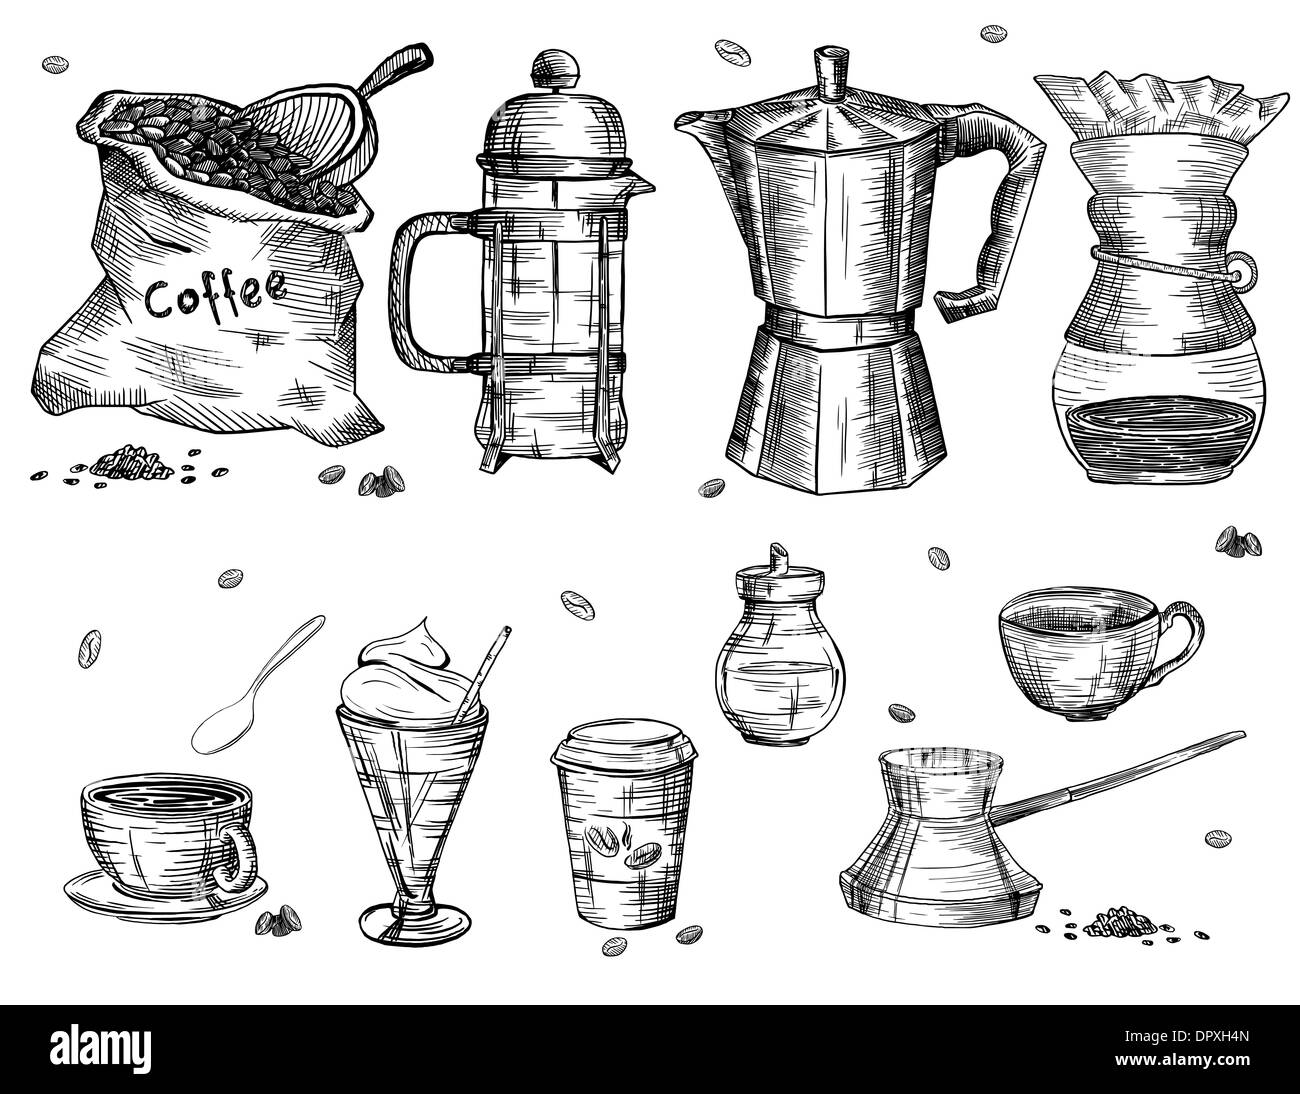 Coffee ware - Stock Image